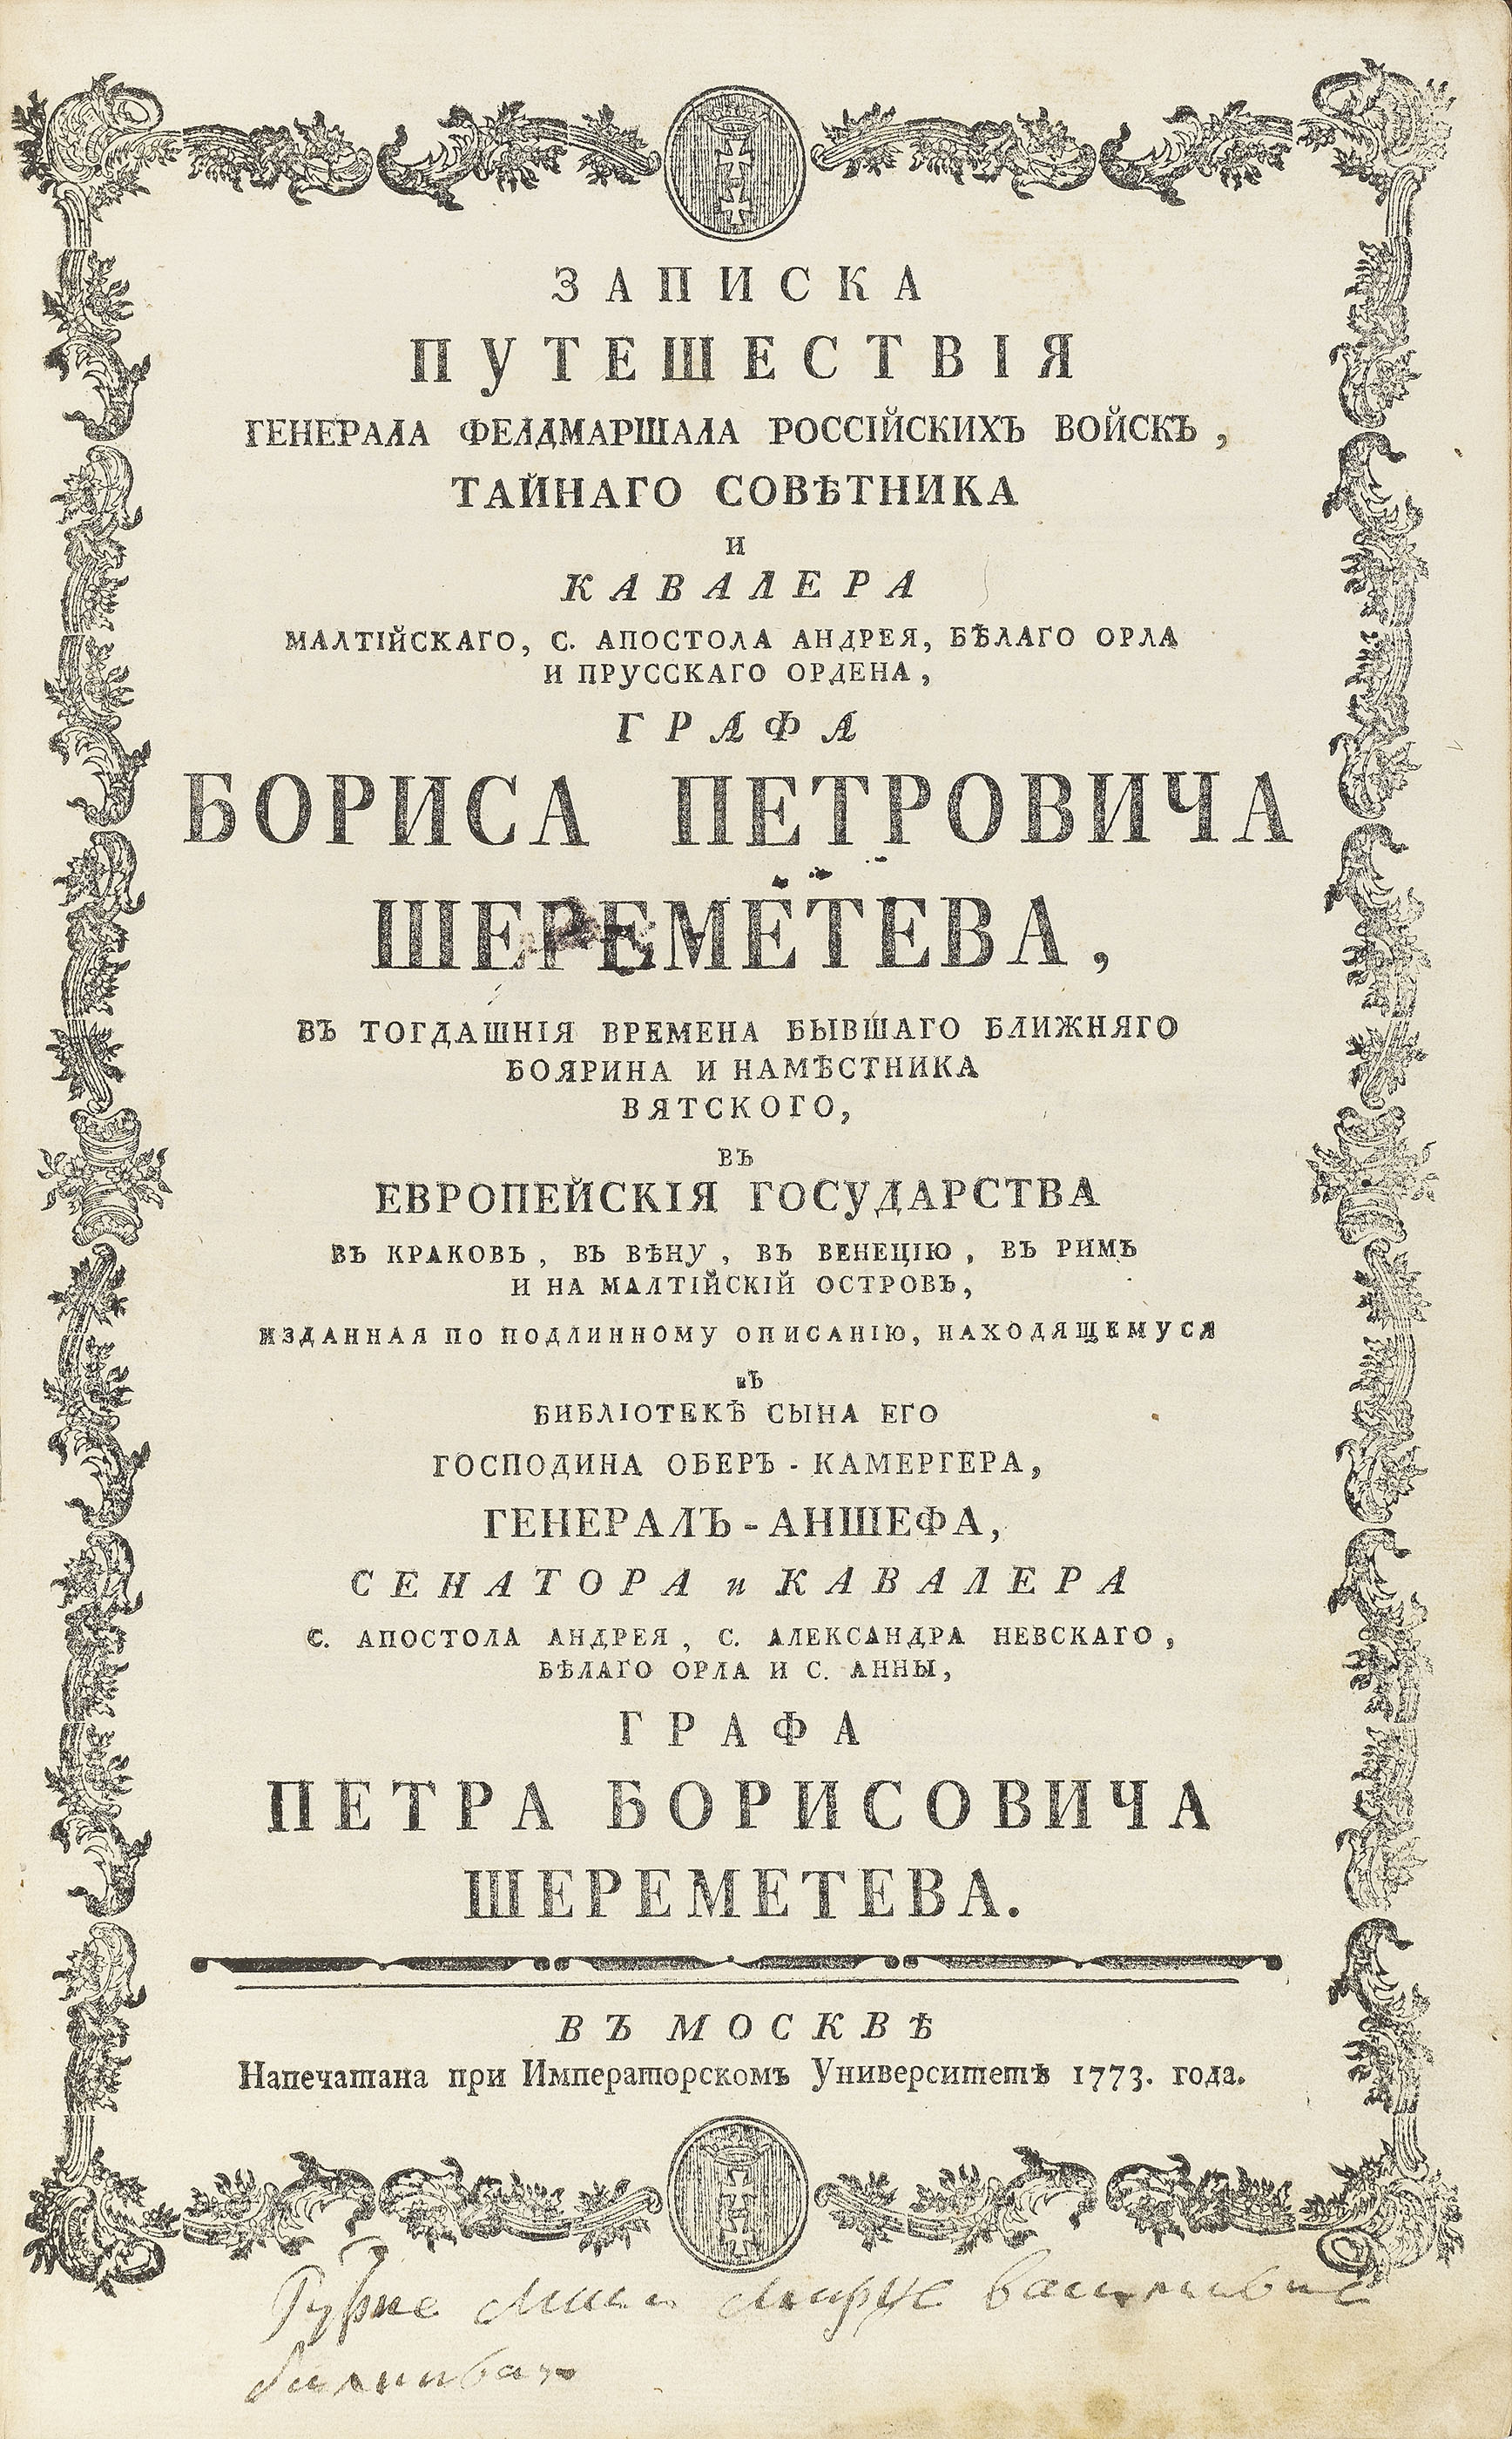 SHEREMETEV, Petr Borisovich (1713-1788). Zapiska Puteshestviia Grafa Borisa Petrovicha Sheremeteva. [Description of the Voyages of Count Boris Petrovich Sheremetev.] Moscow: Imperial University, 1773.